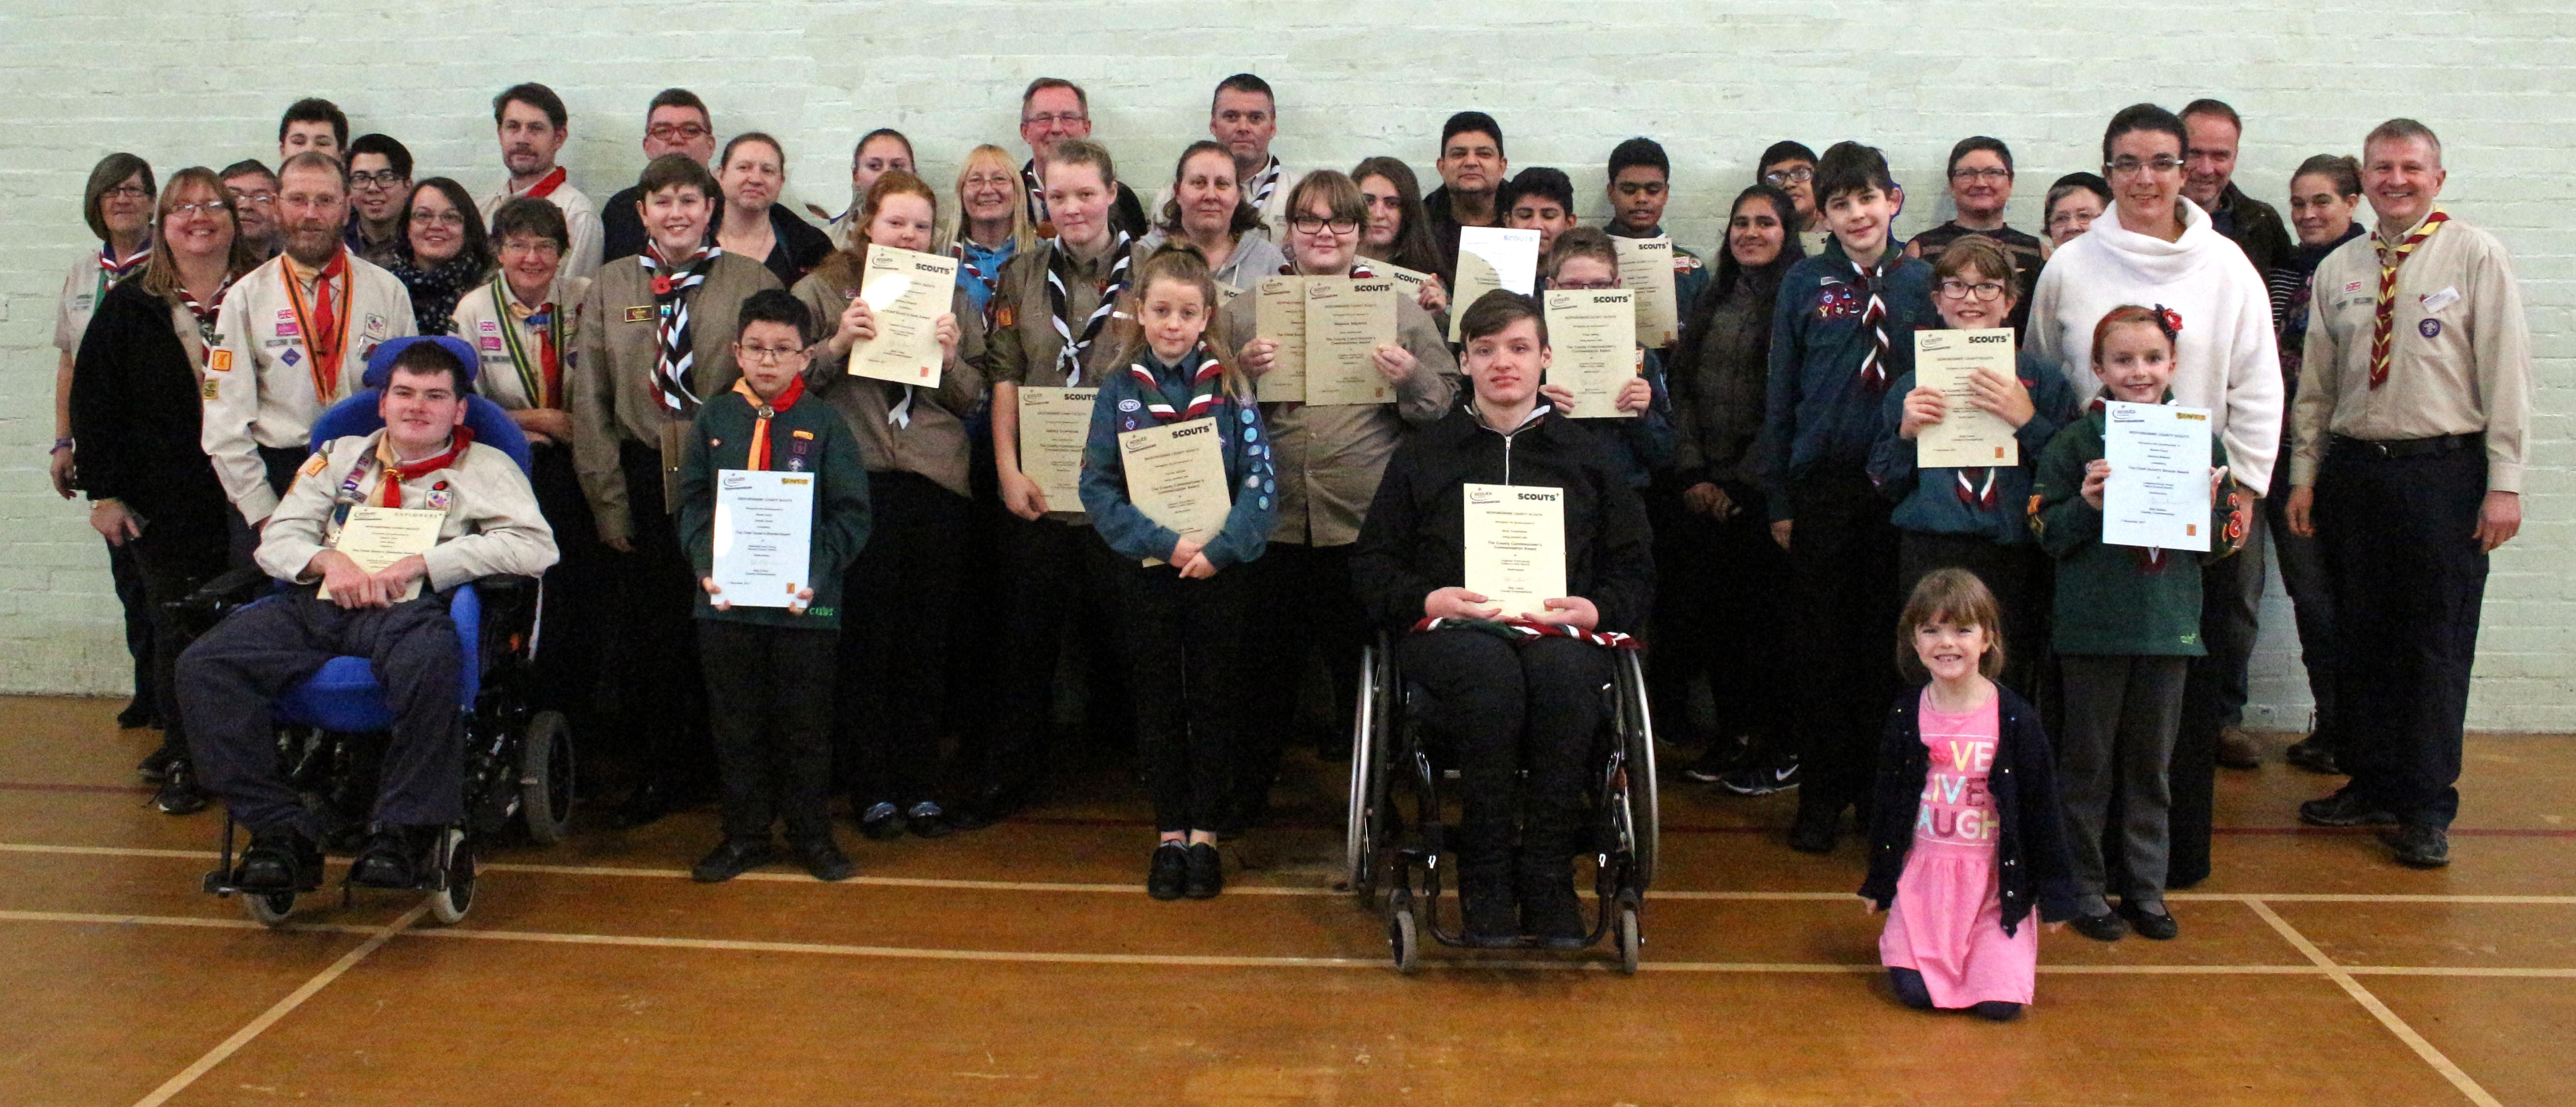 Bedfordshire County Award Presentation Day 2017